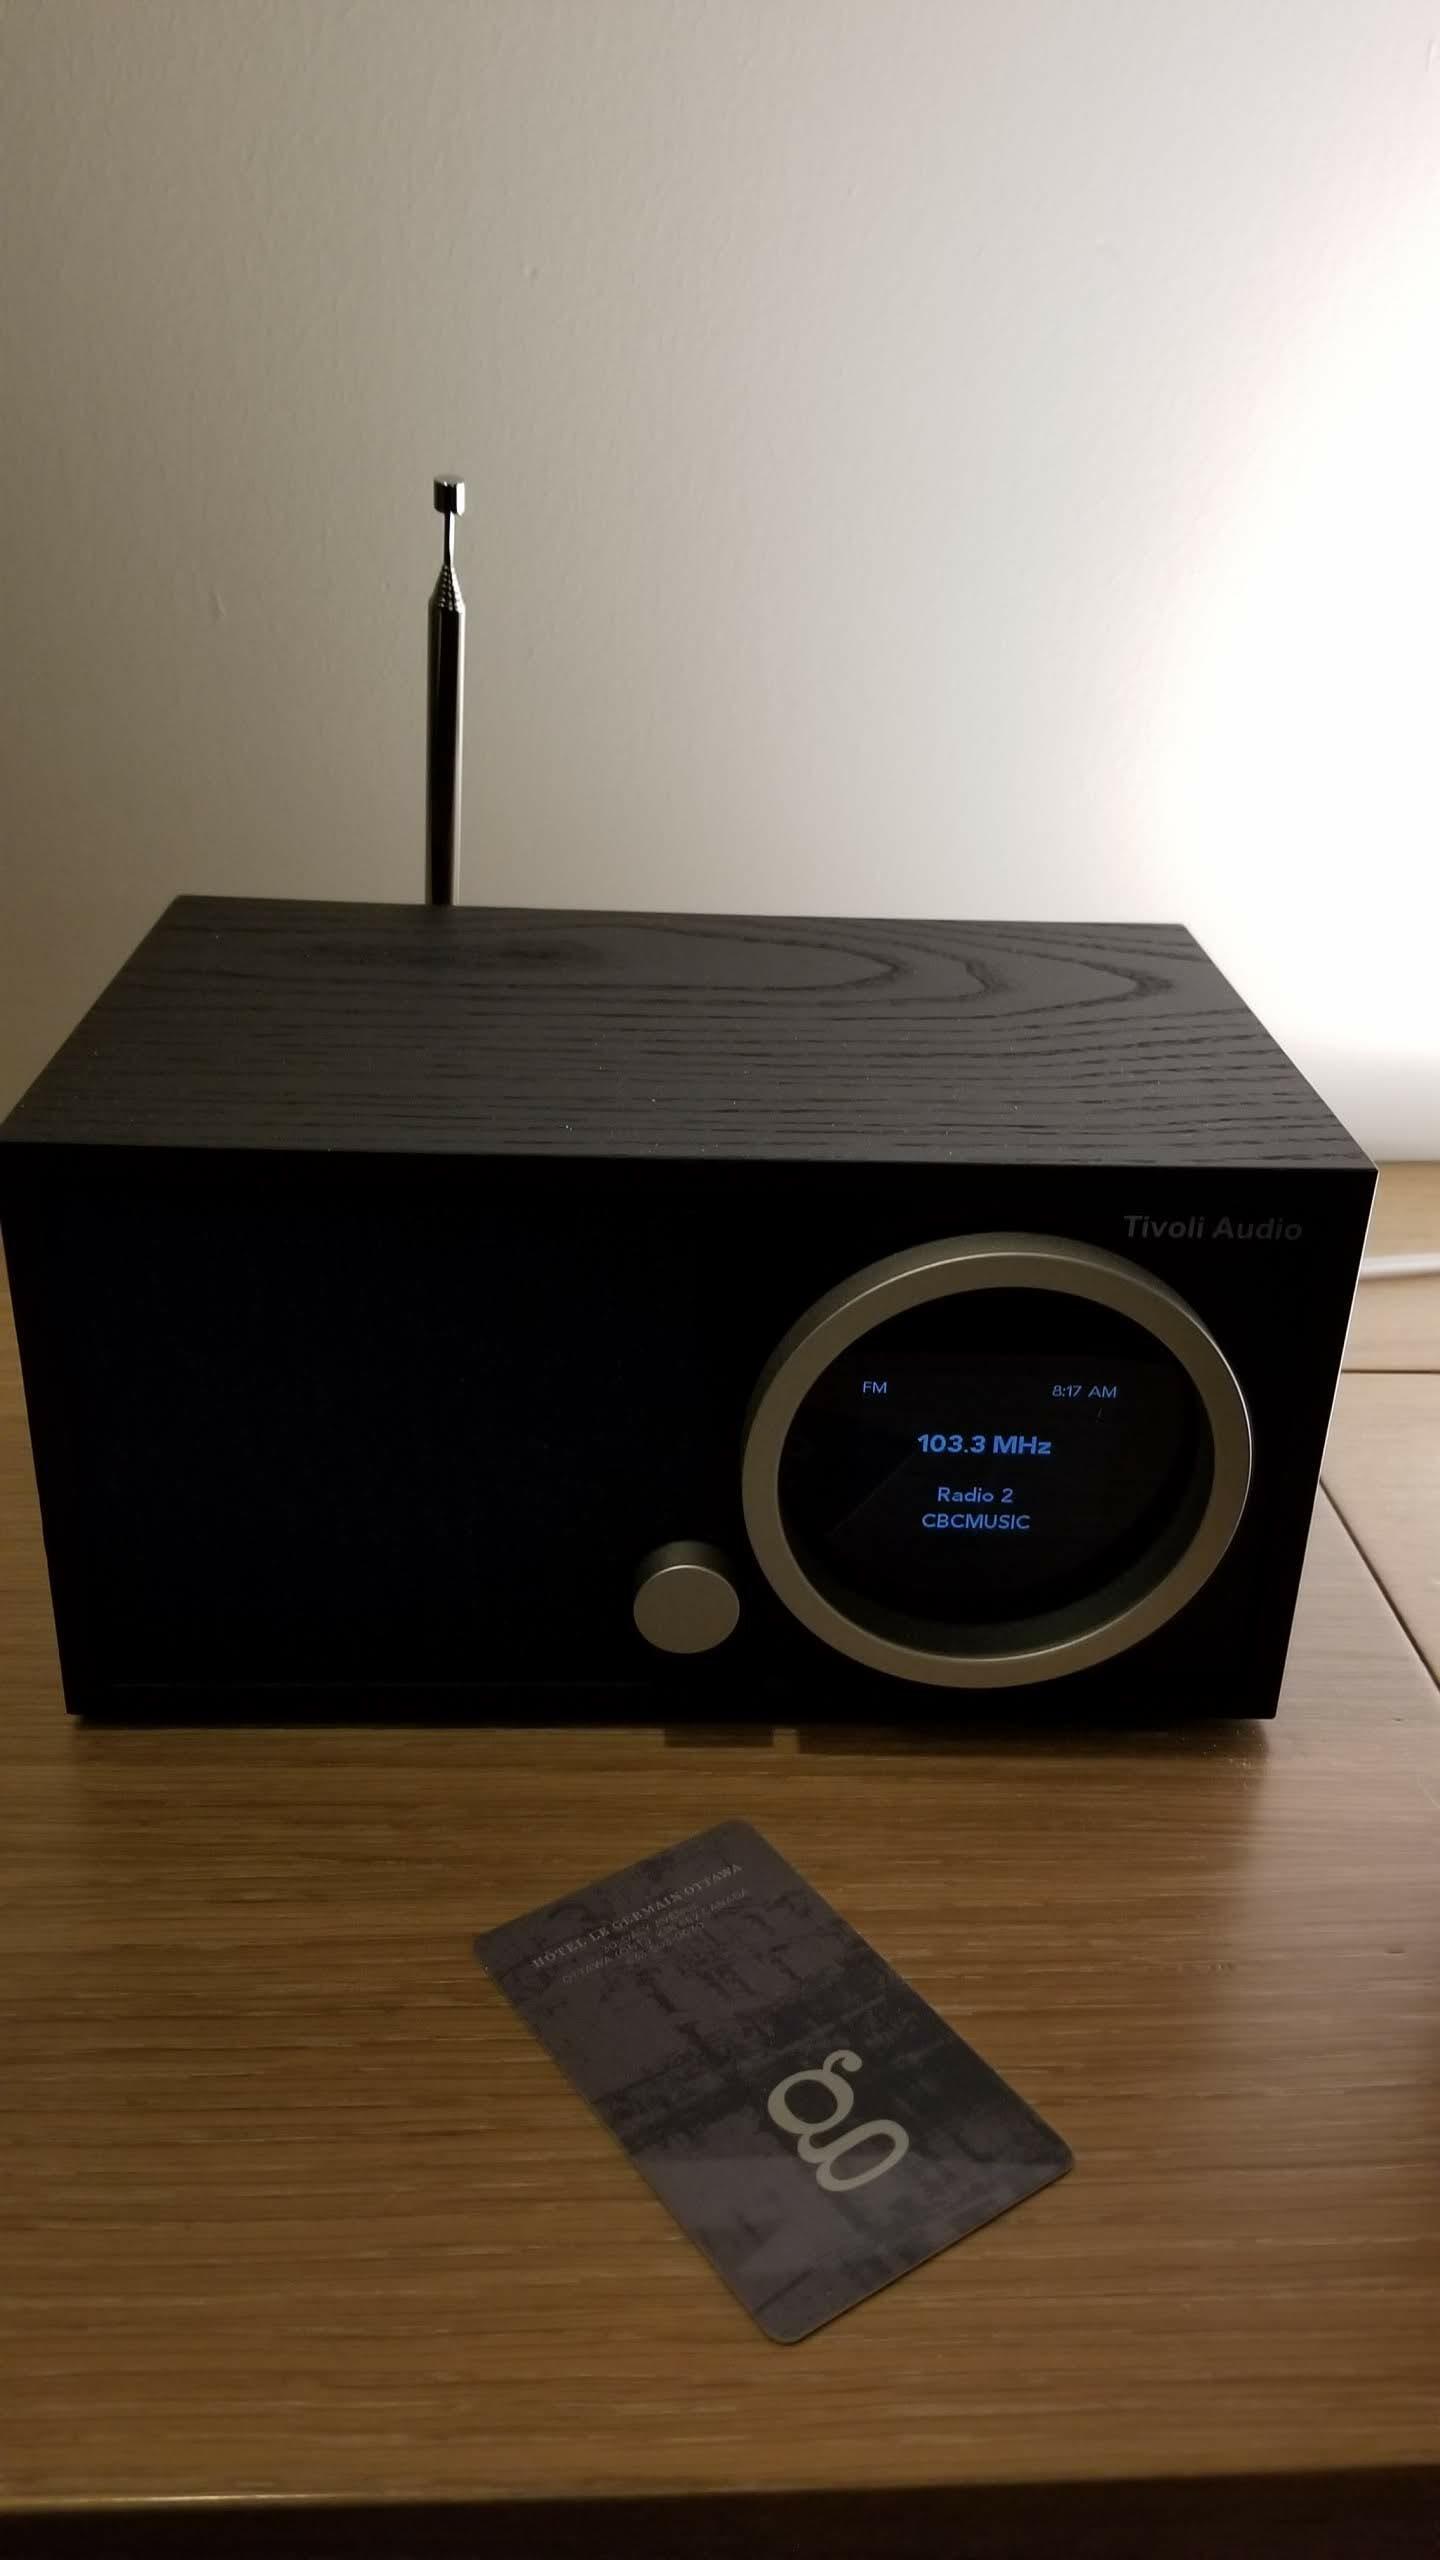 Tivoli radio in the room